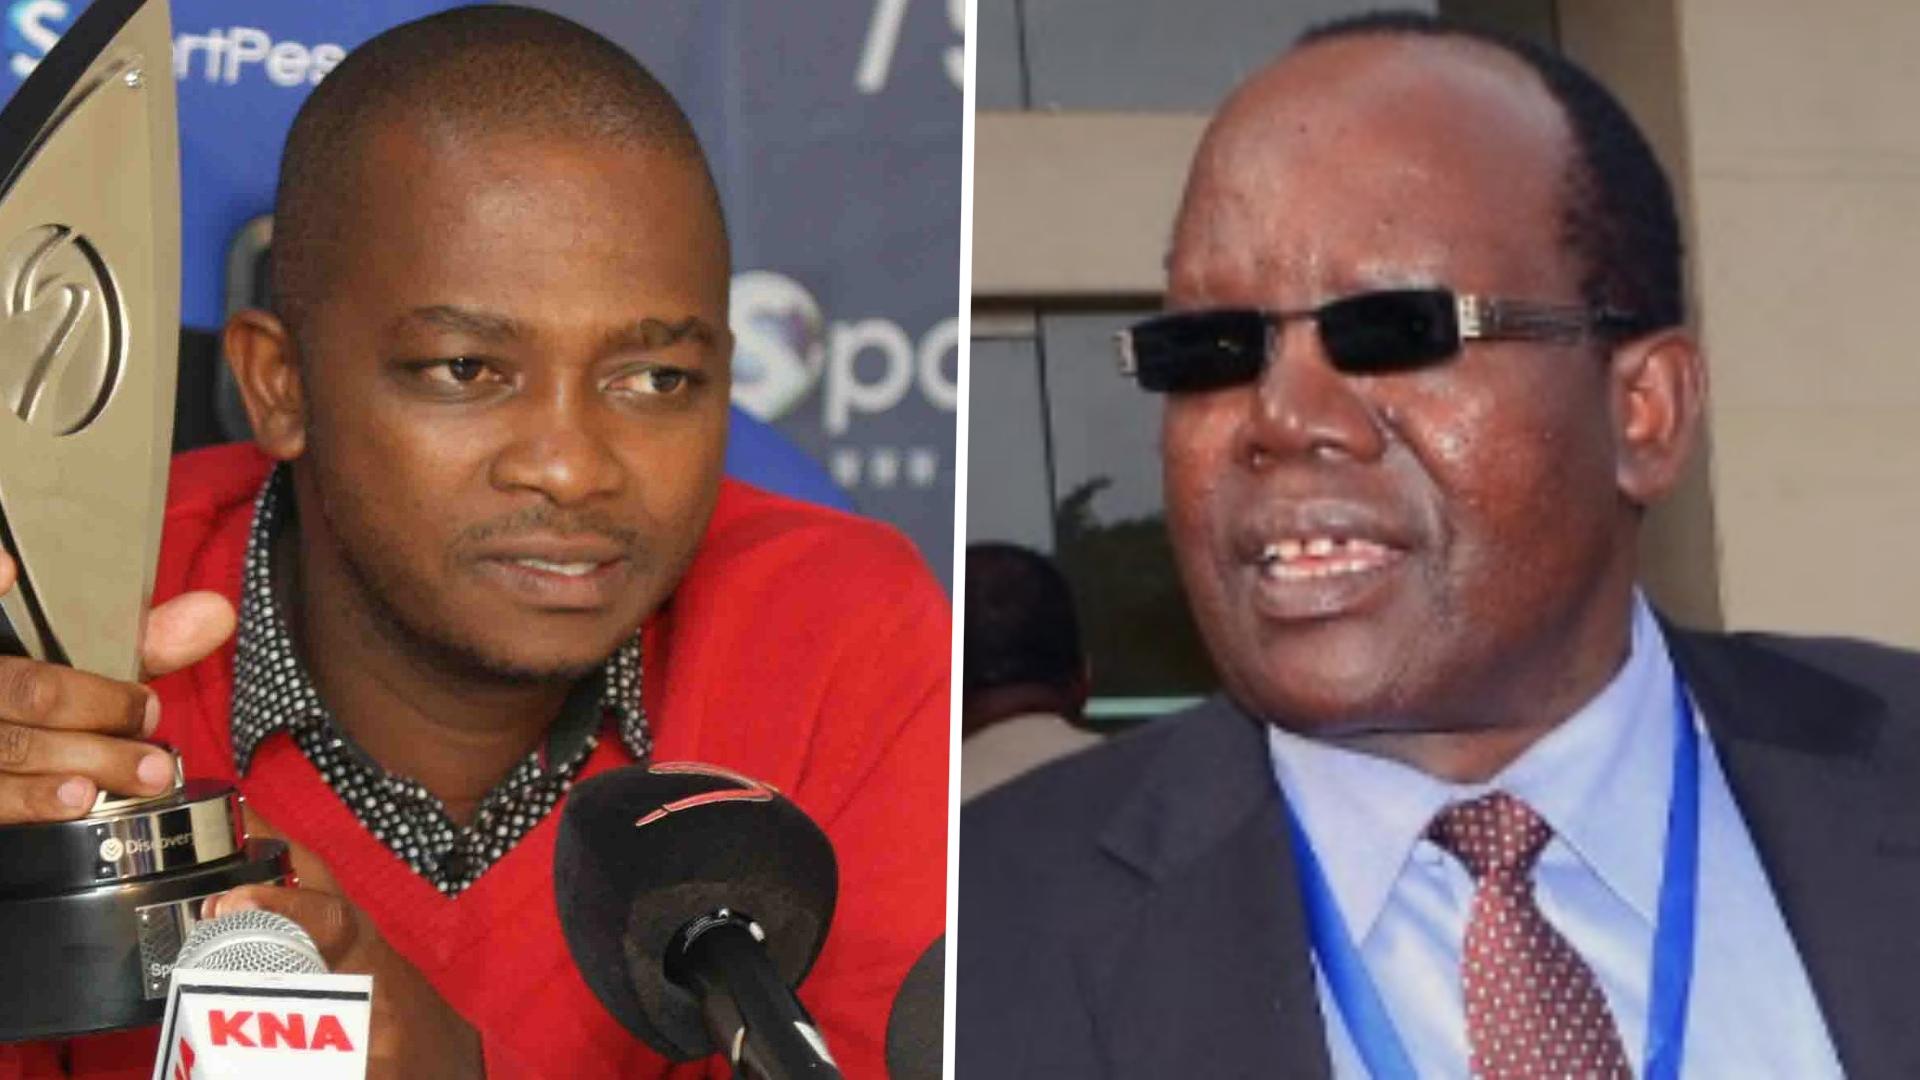 Fifa has thrown Mwendwa under the bus - FKF presidential aspirant Nyamweya